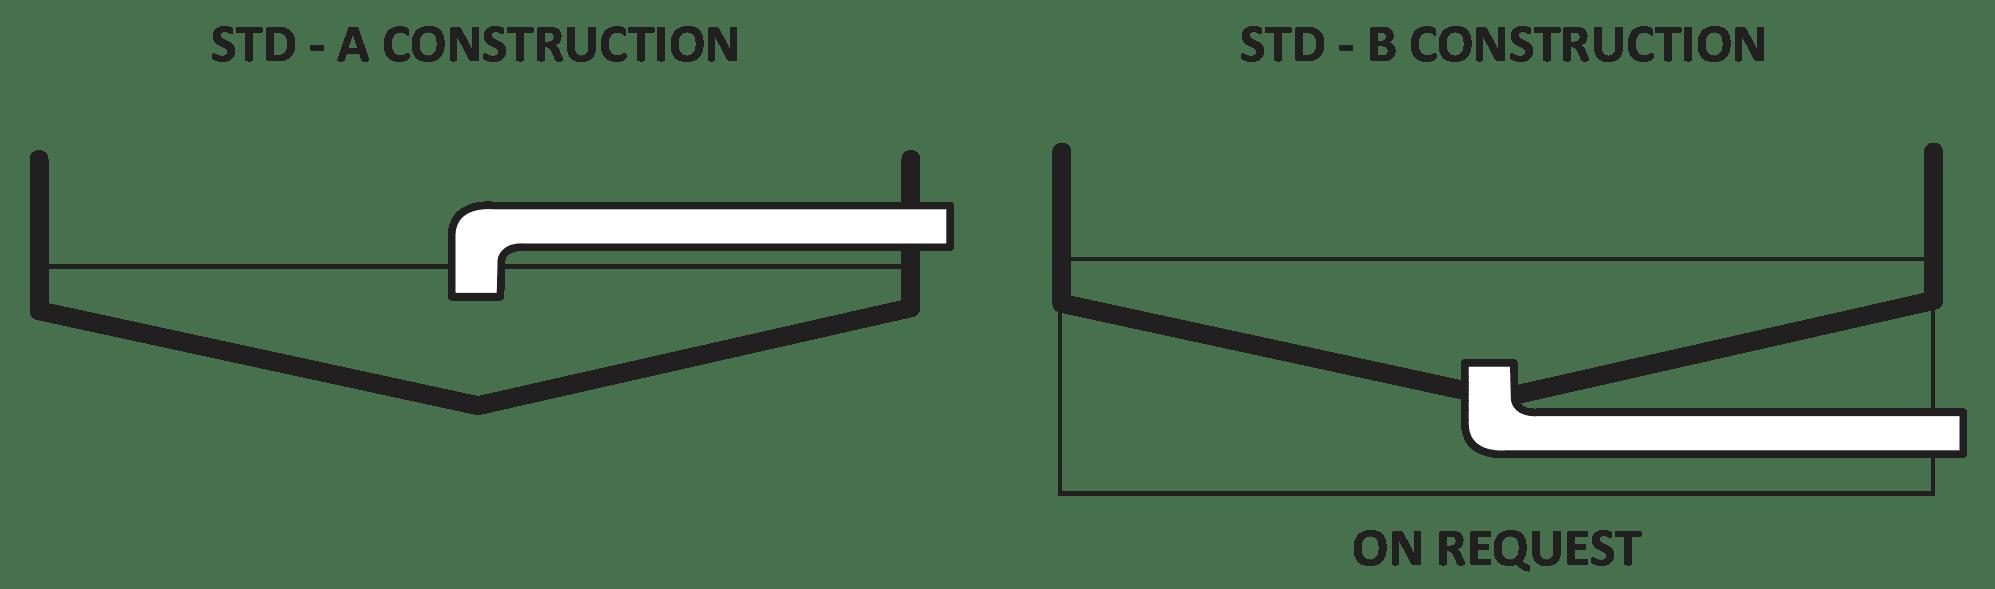 tank1 illustration